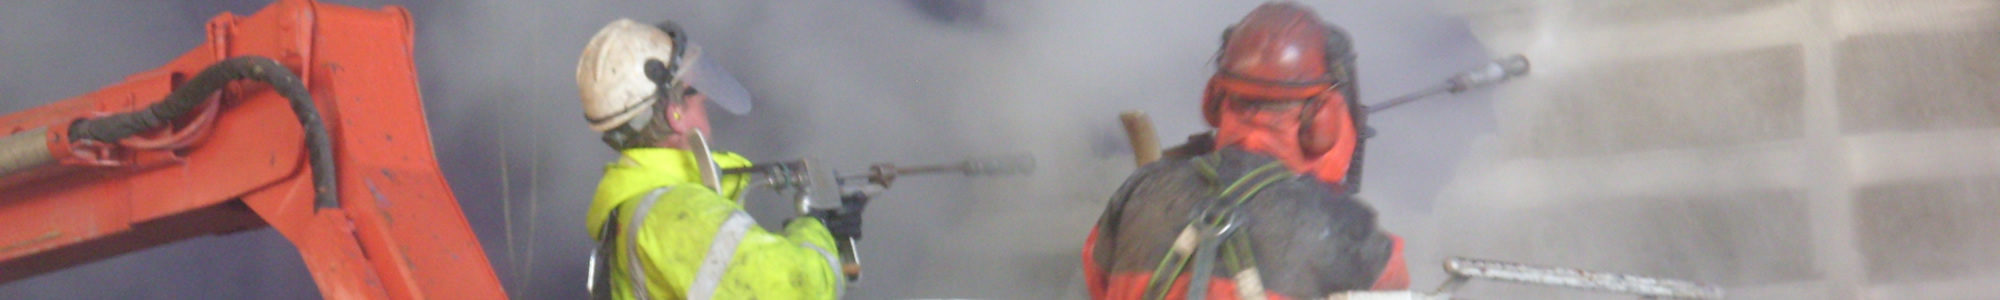 Ultra High-Pressure Blasting - Banner Image